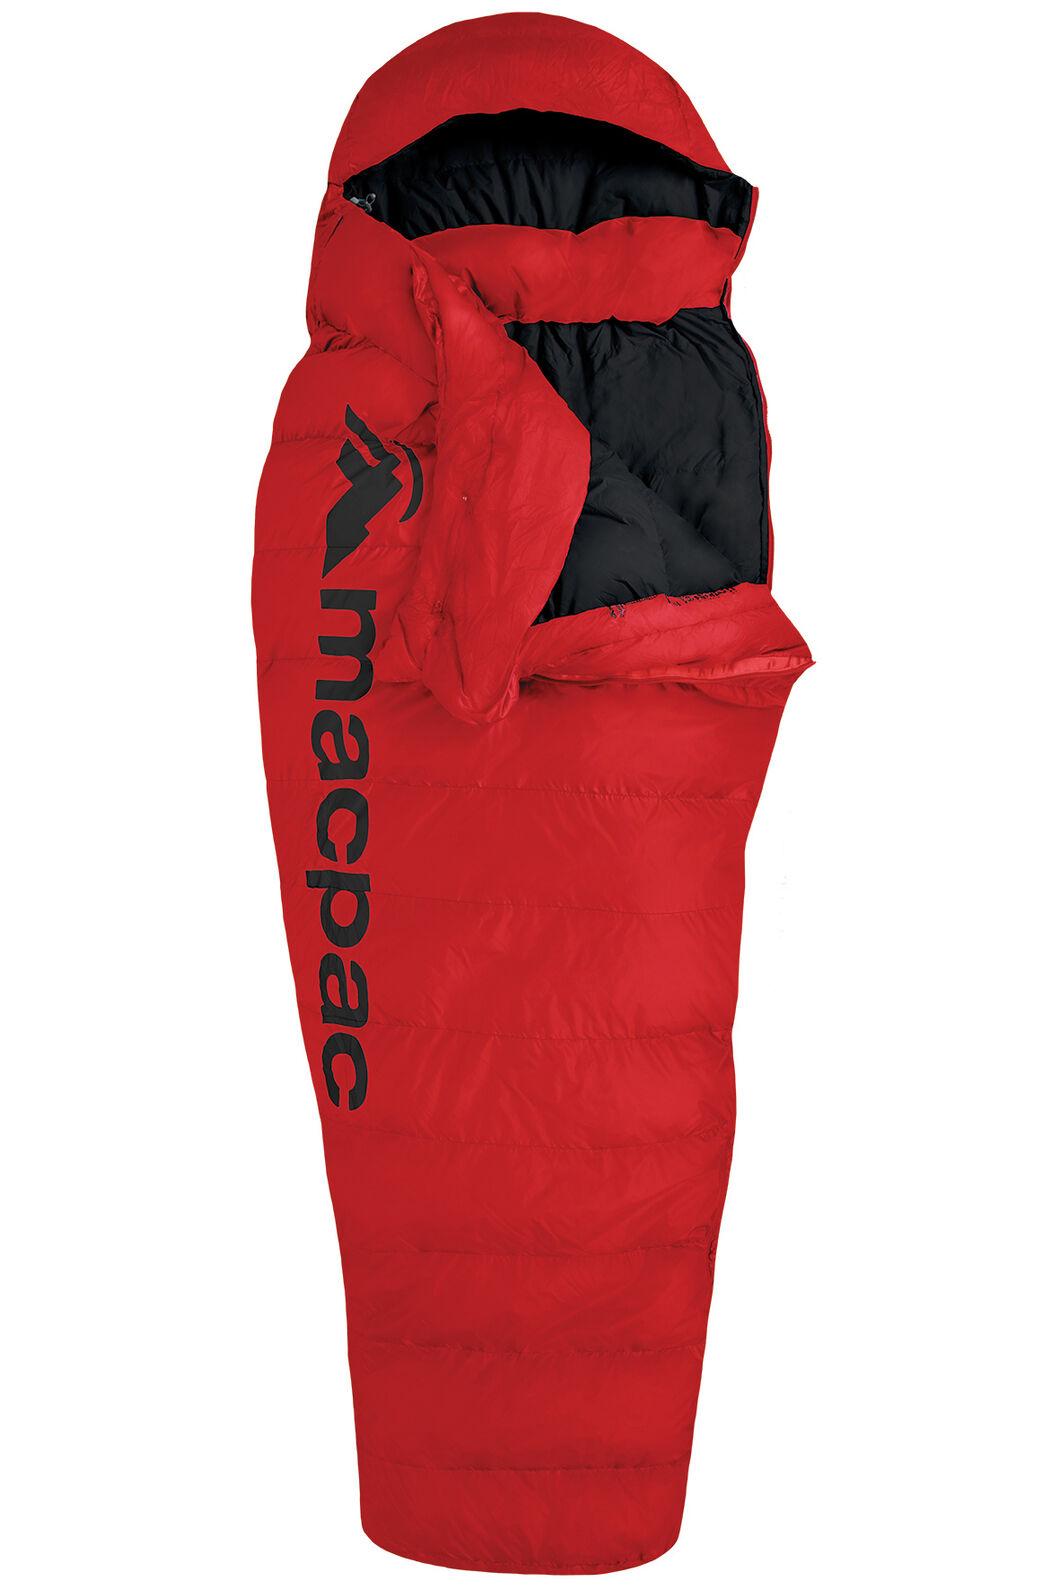 Macpac Overland Down 400 Sleeping Bag - Extra Large, Flame Scarlet, hi-res